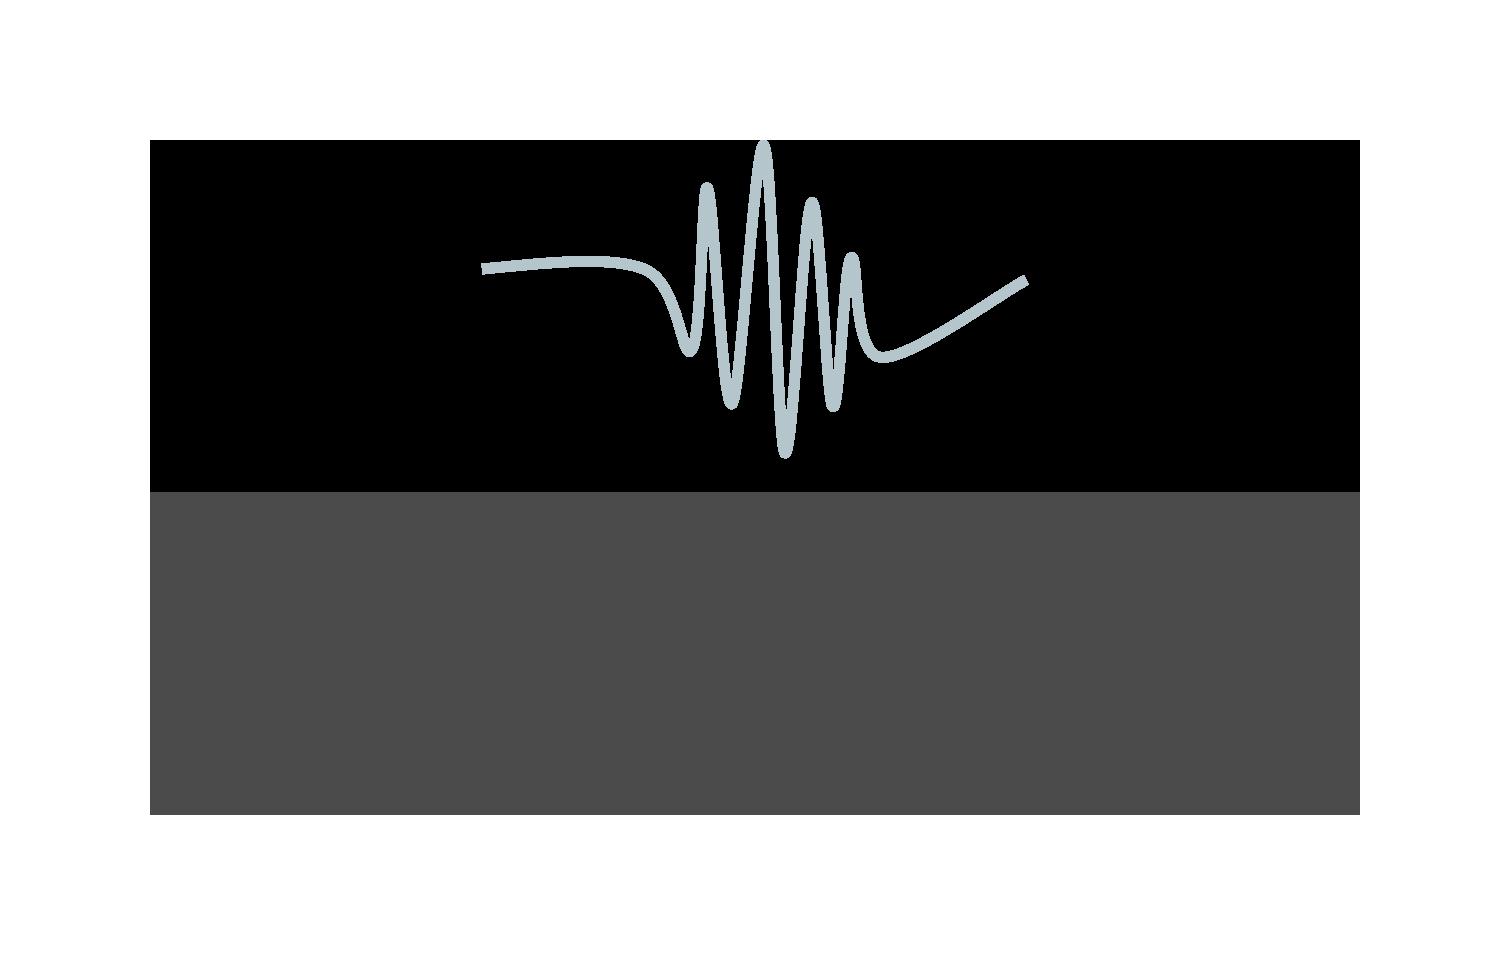 Audio Logique